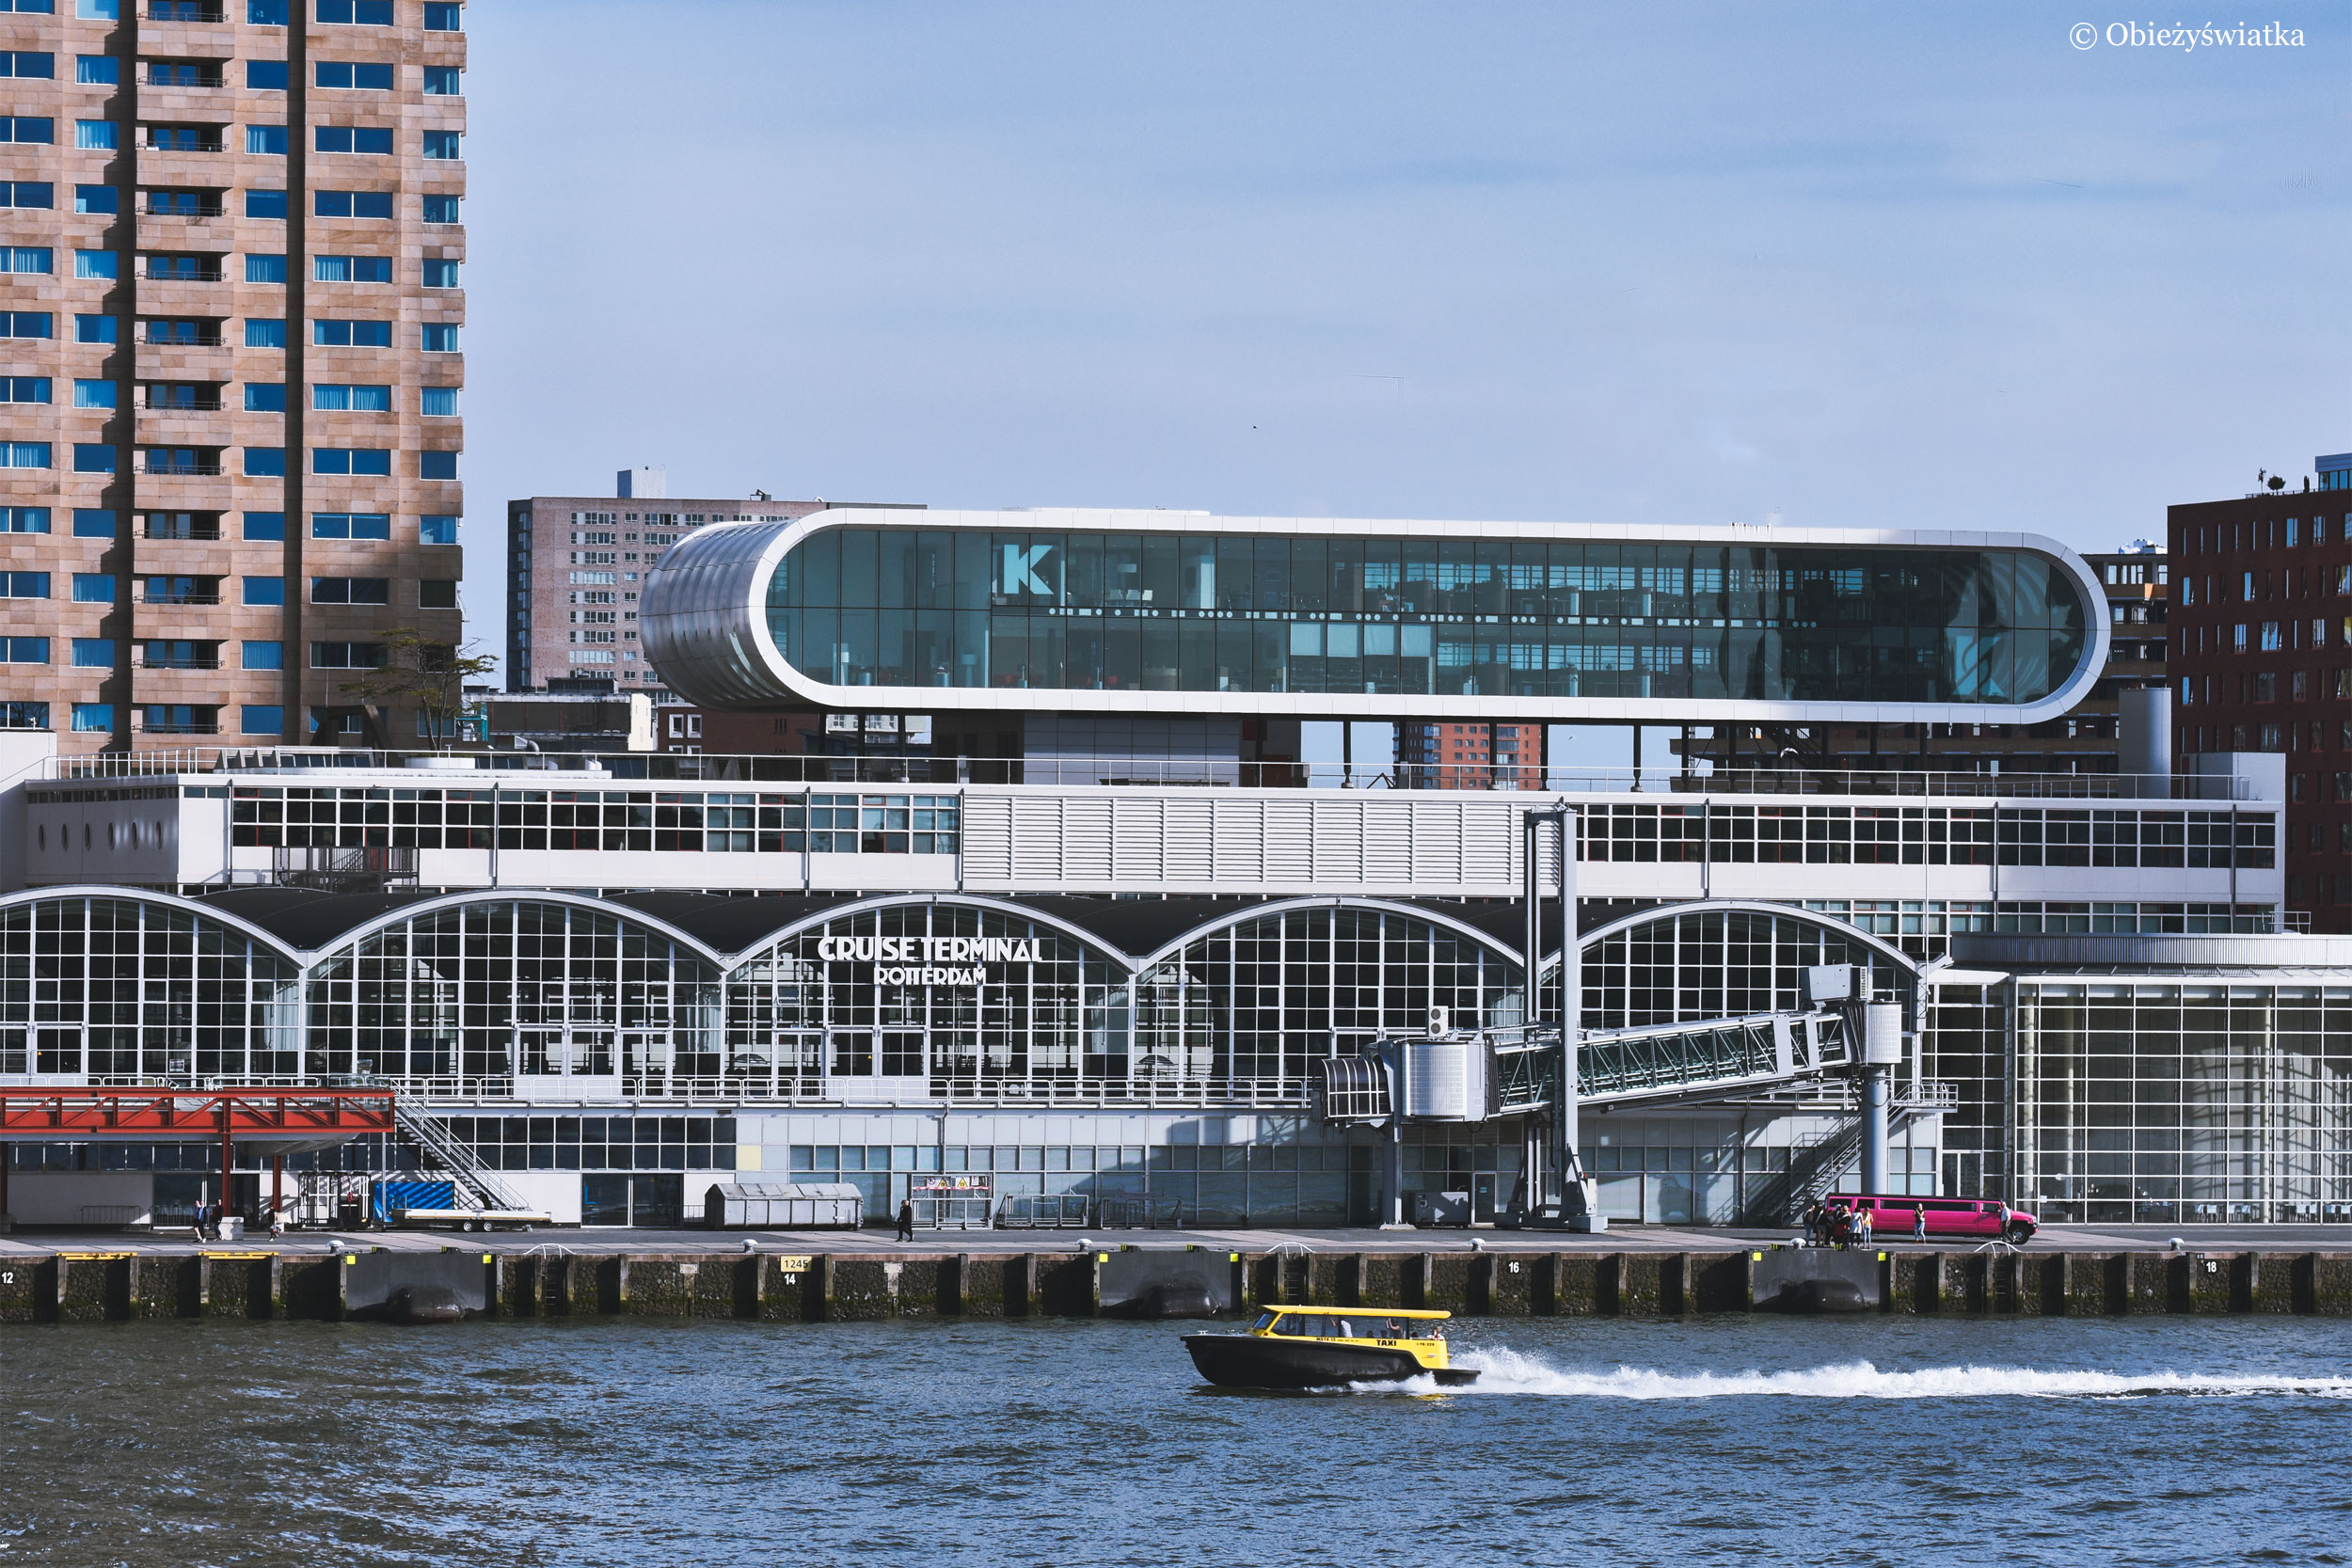 Cruise Terminal w Rotterdamie